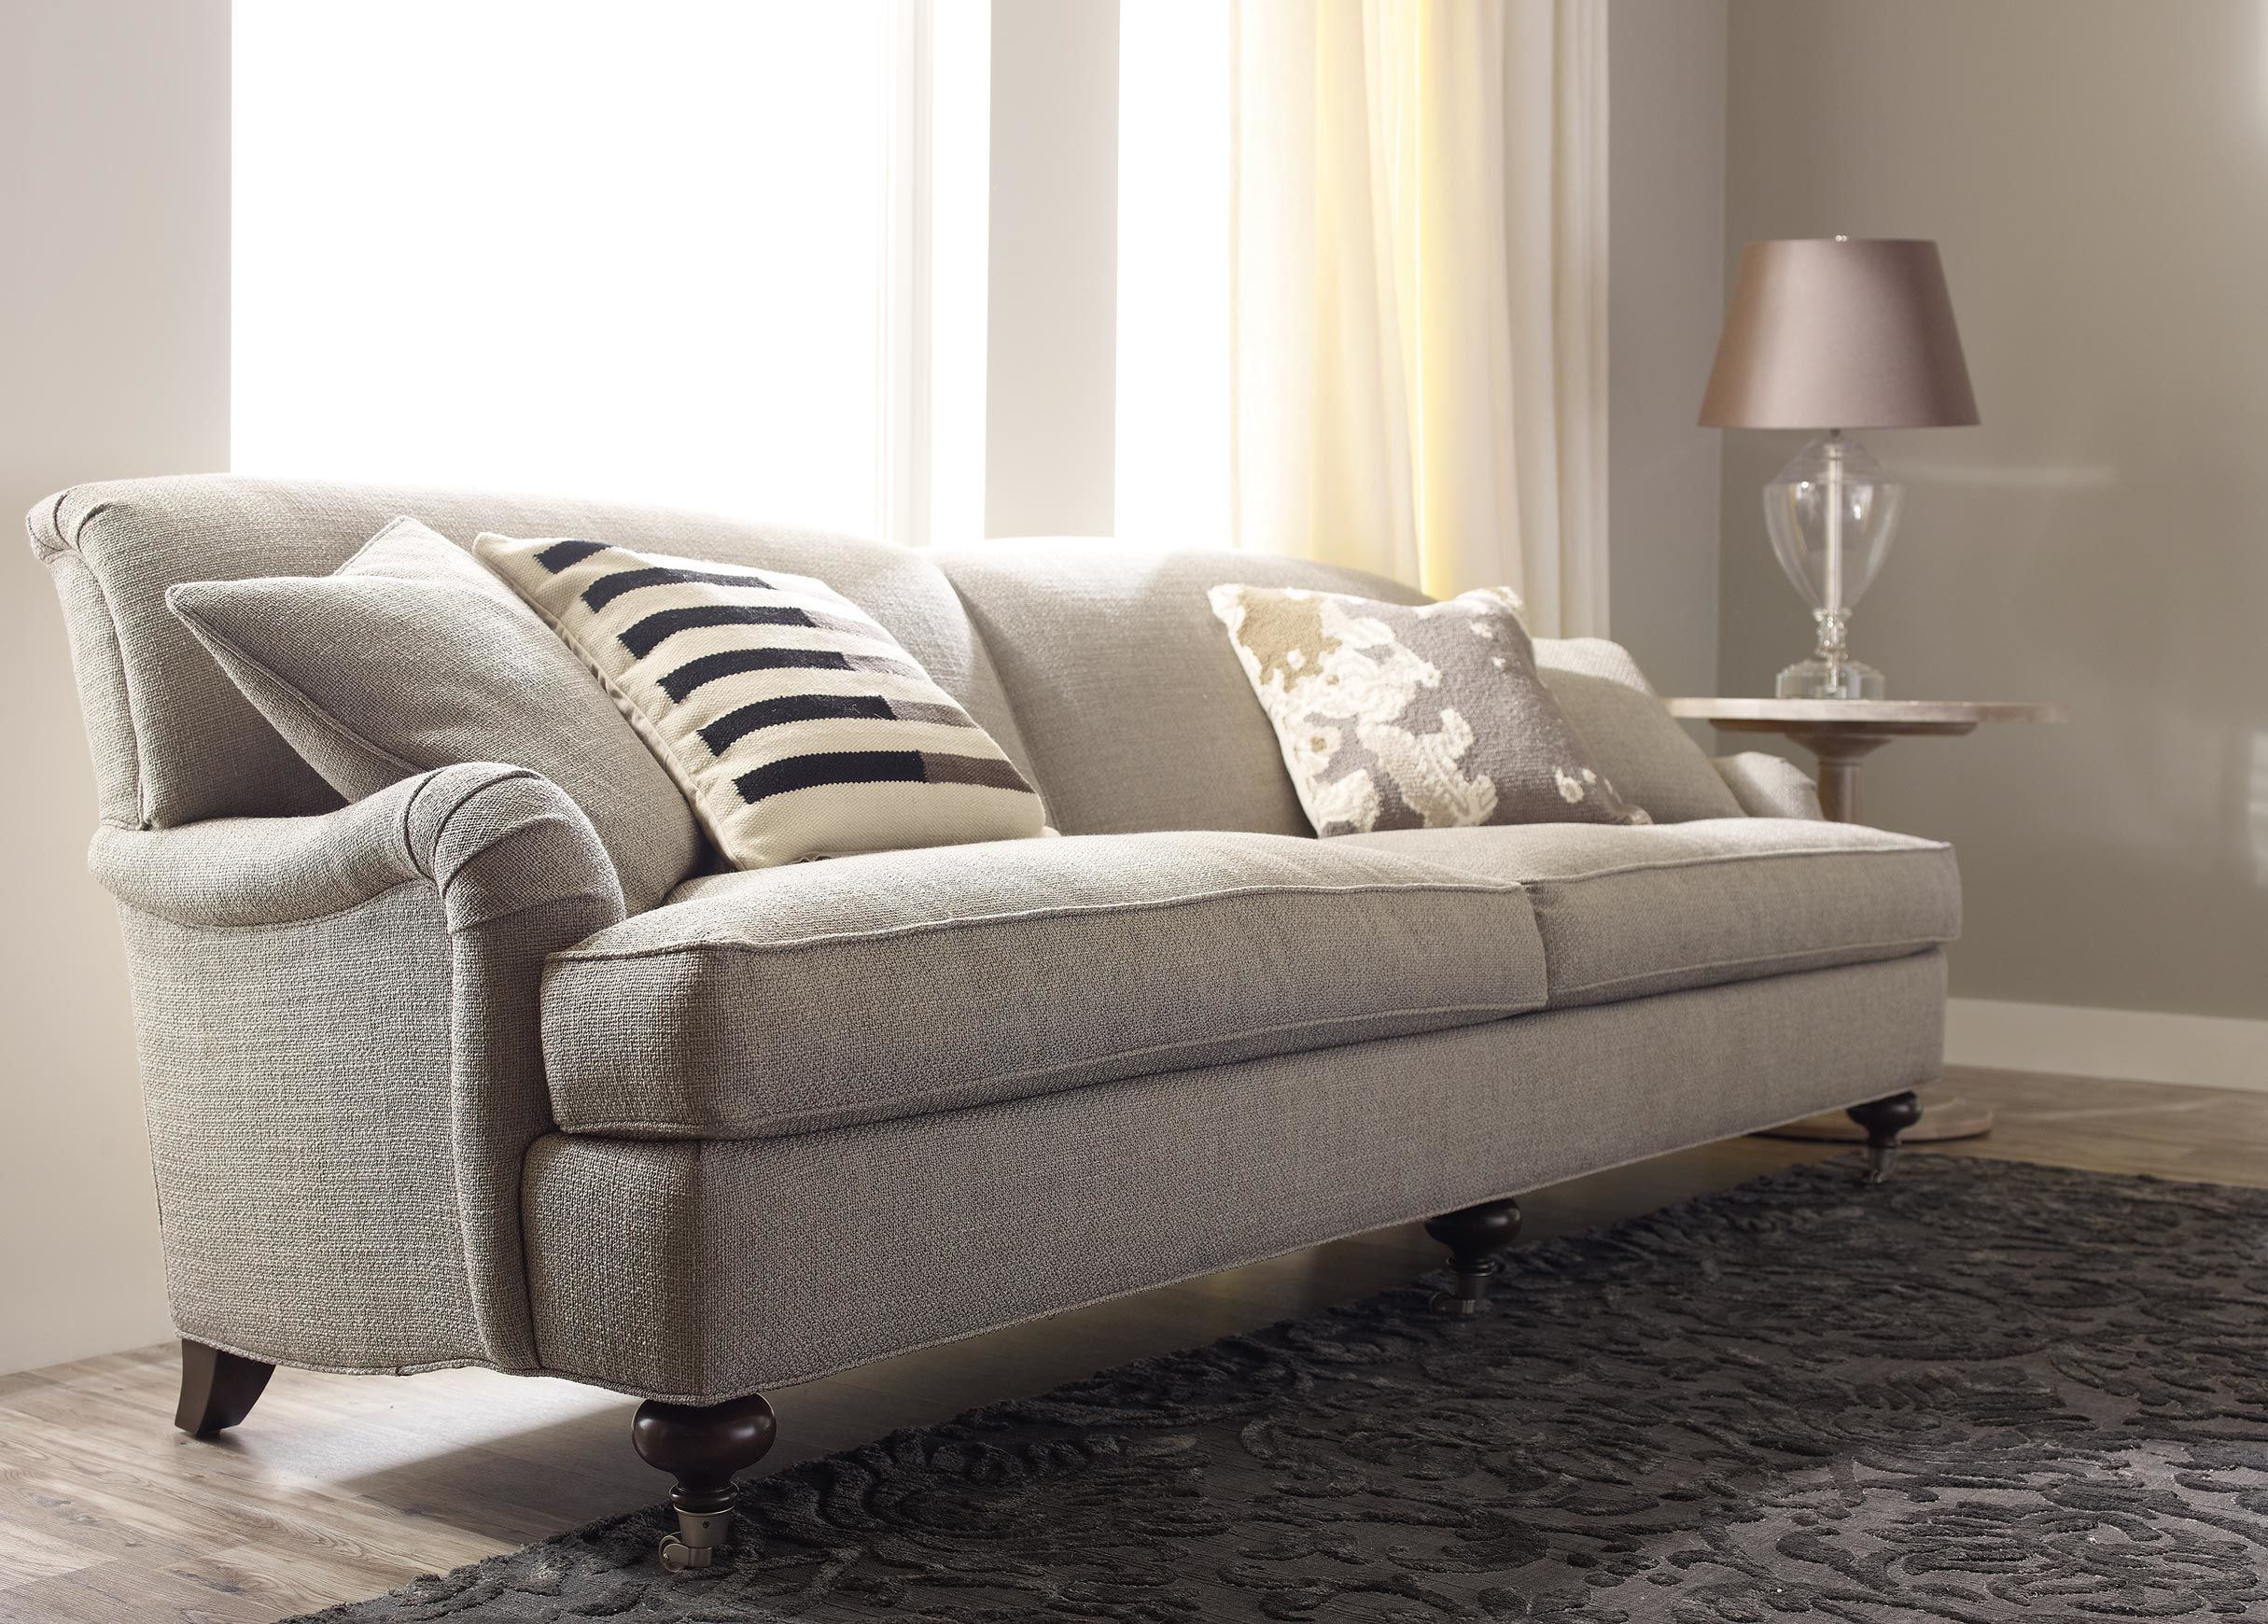 Oxford Sofa Sofas And Loveseats Sofa Design Love Seat Ethan